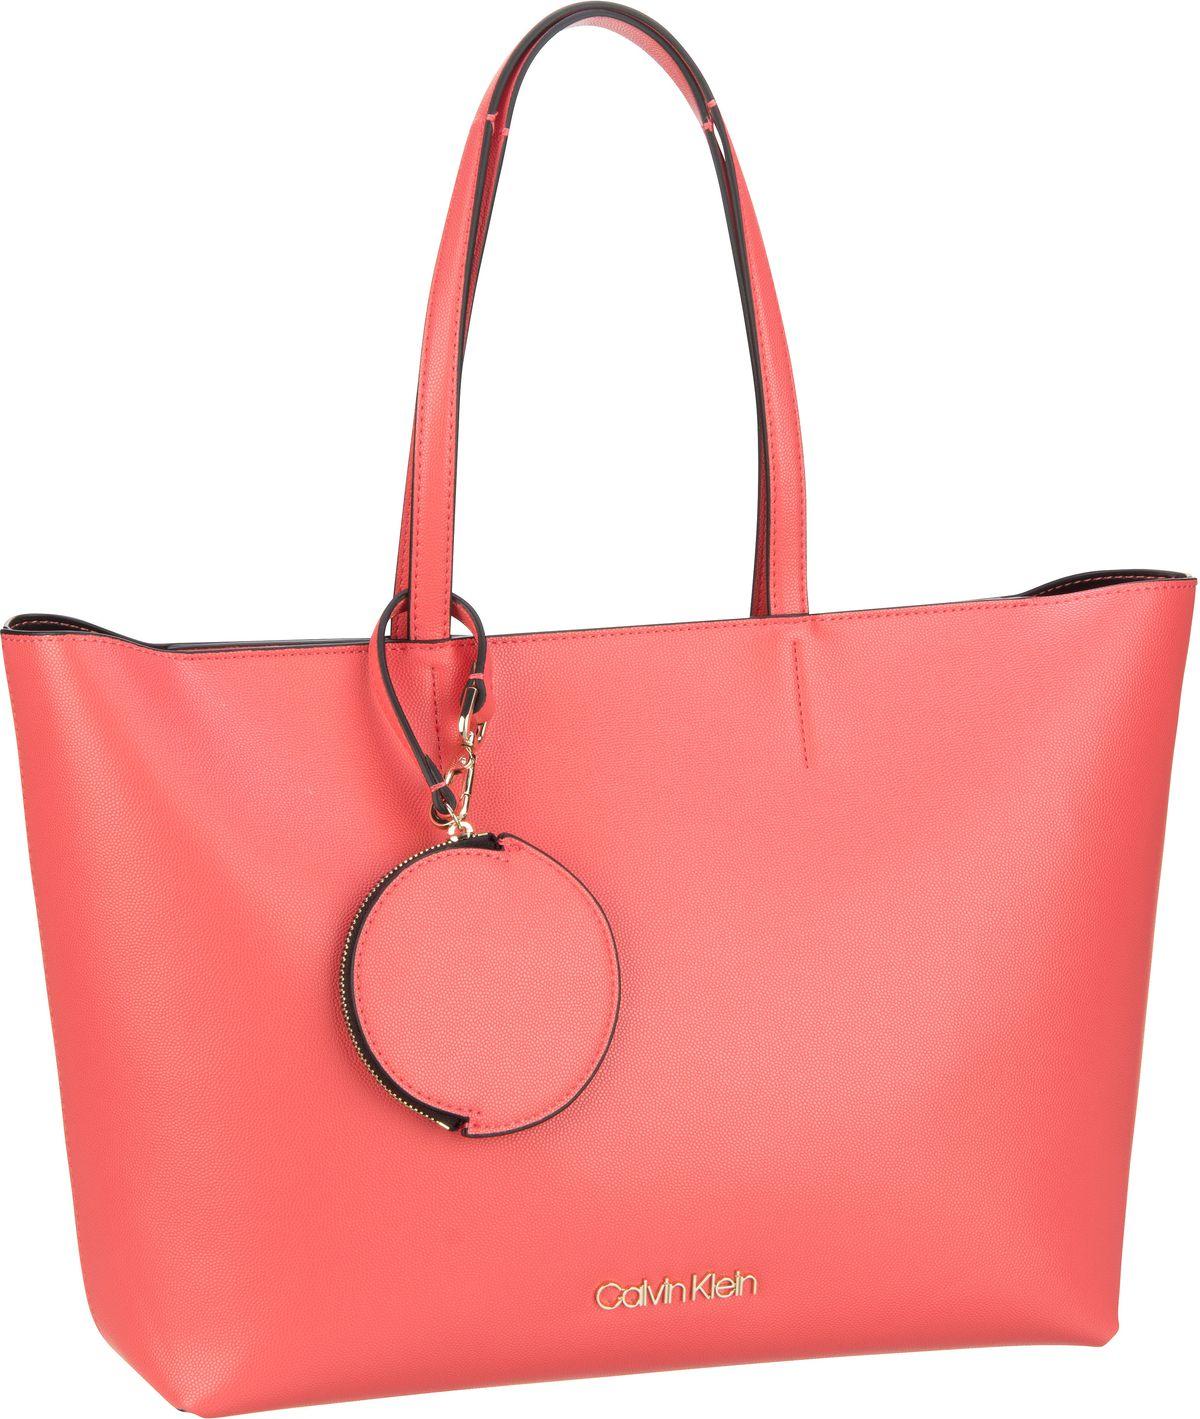 Handtasche CK Must Shopper MD SP20 Coral